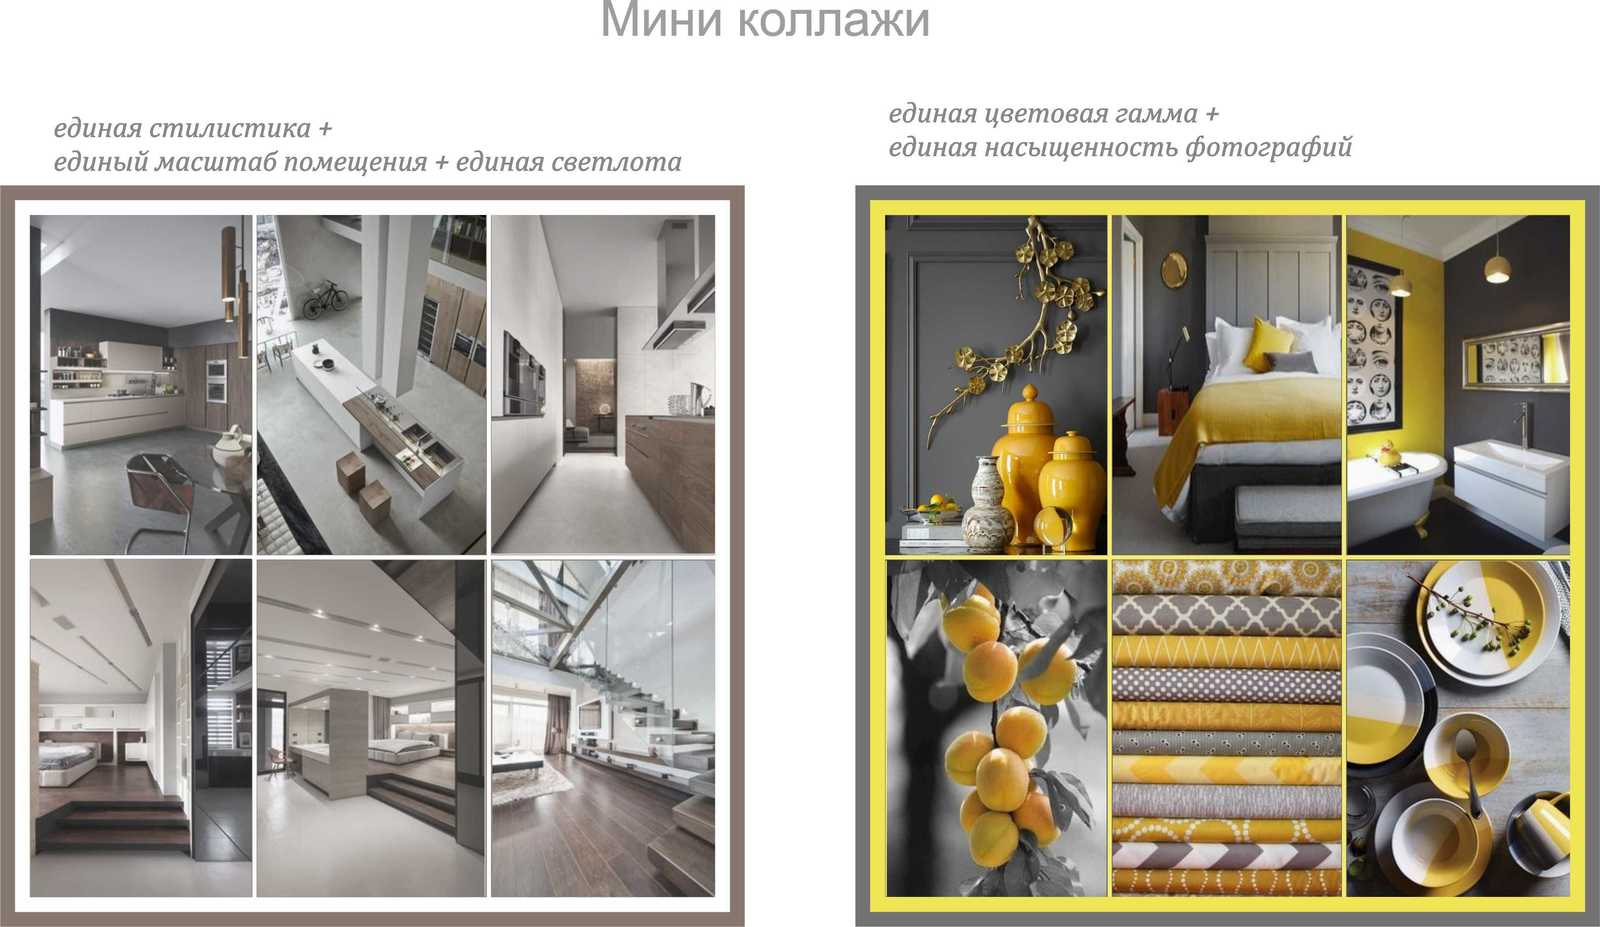 Динара Каюмова_04_3.jpg